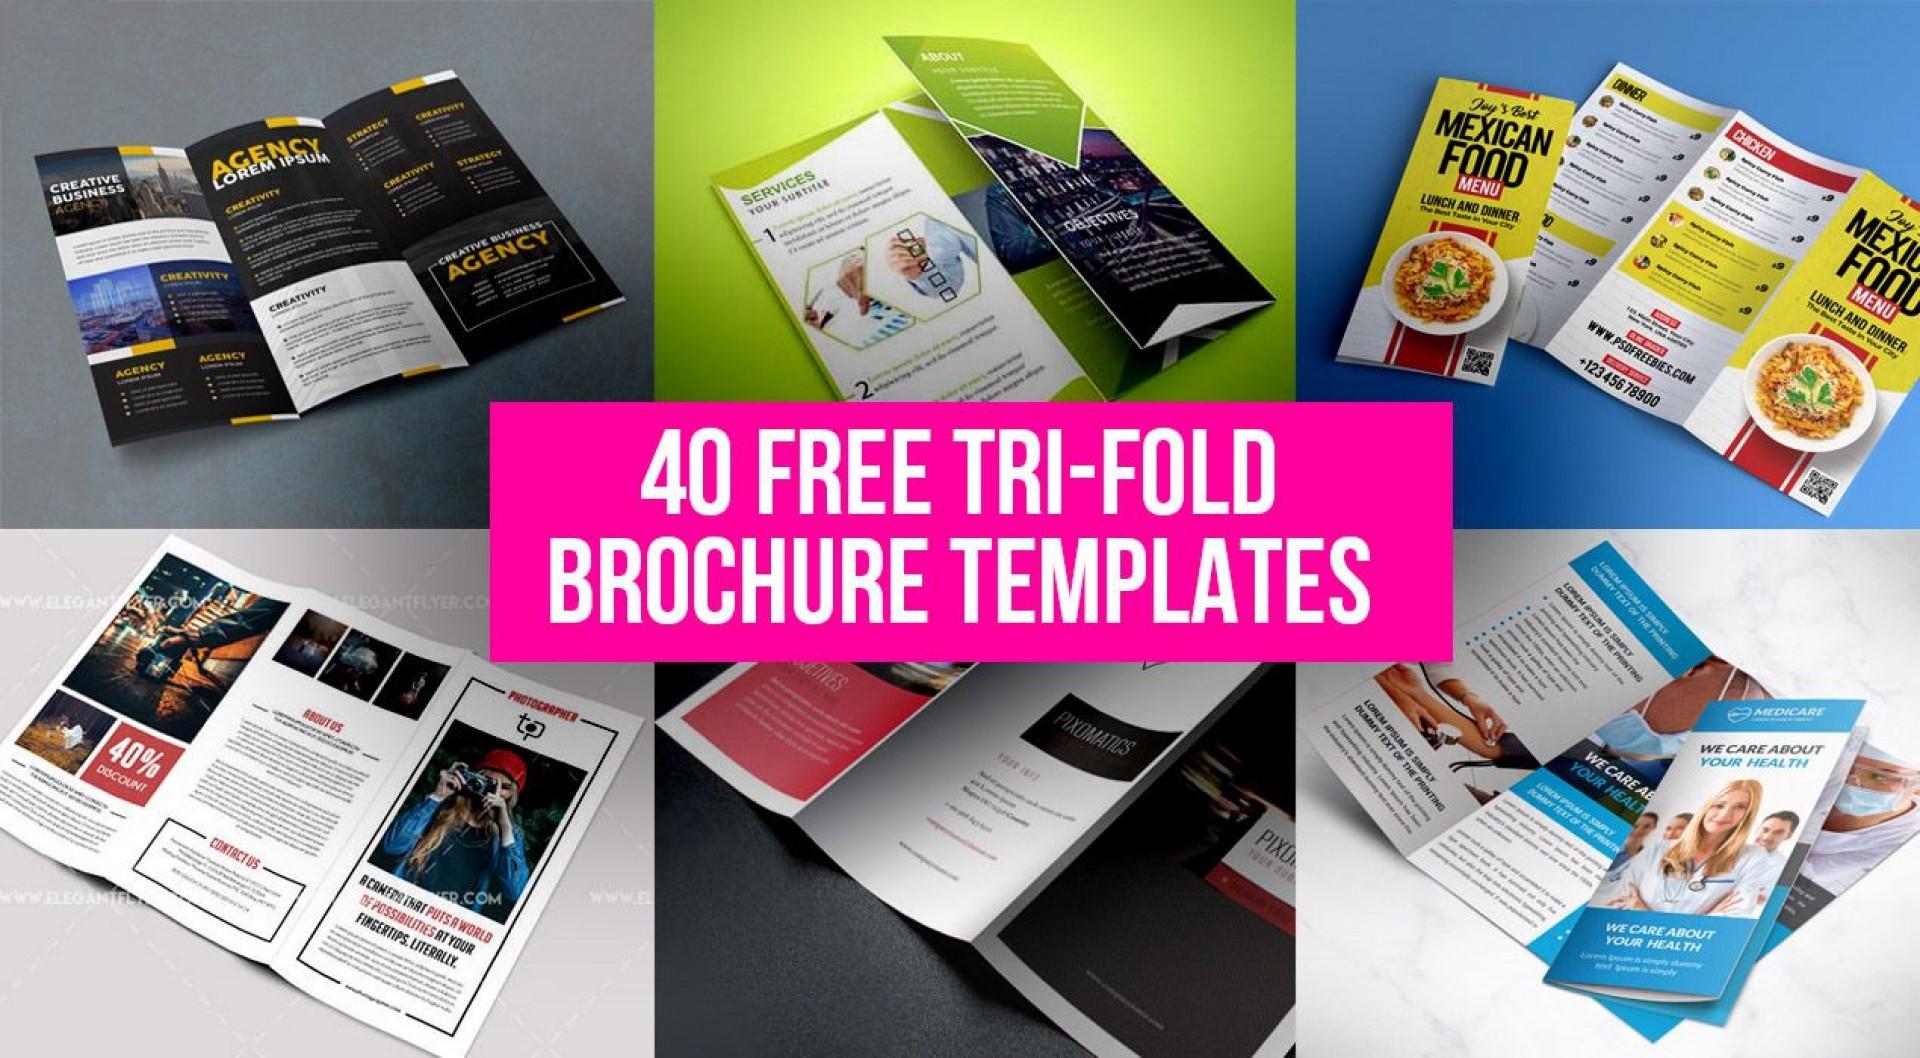 001 Impressive 3 Fold Brochure Template Free Image  Word Download1920